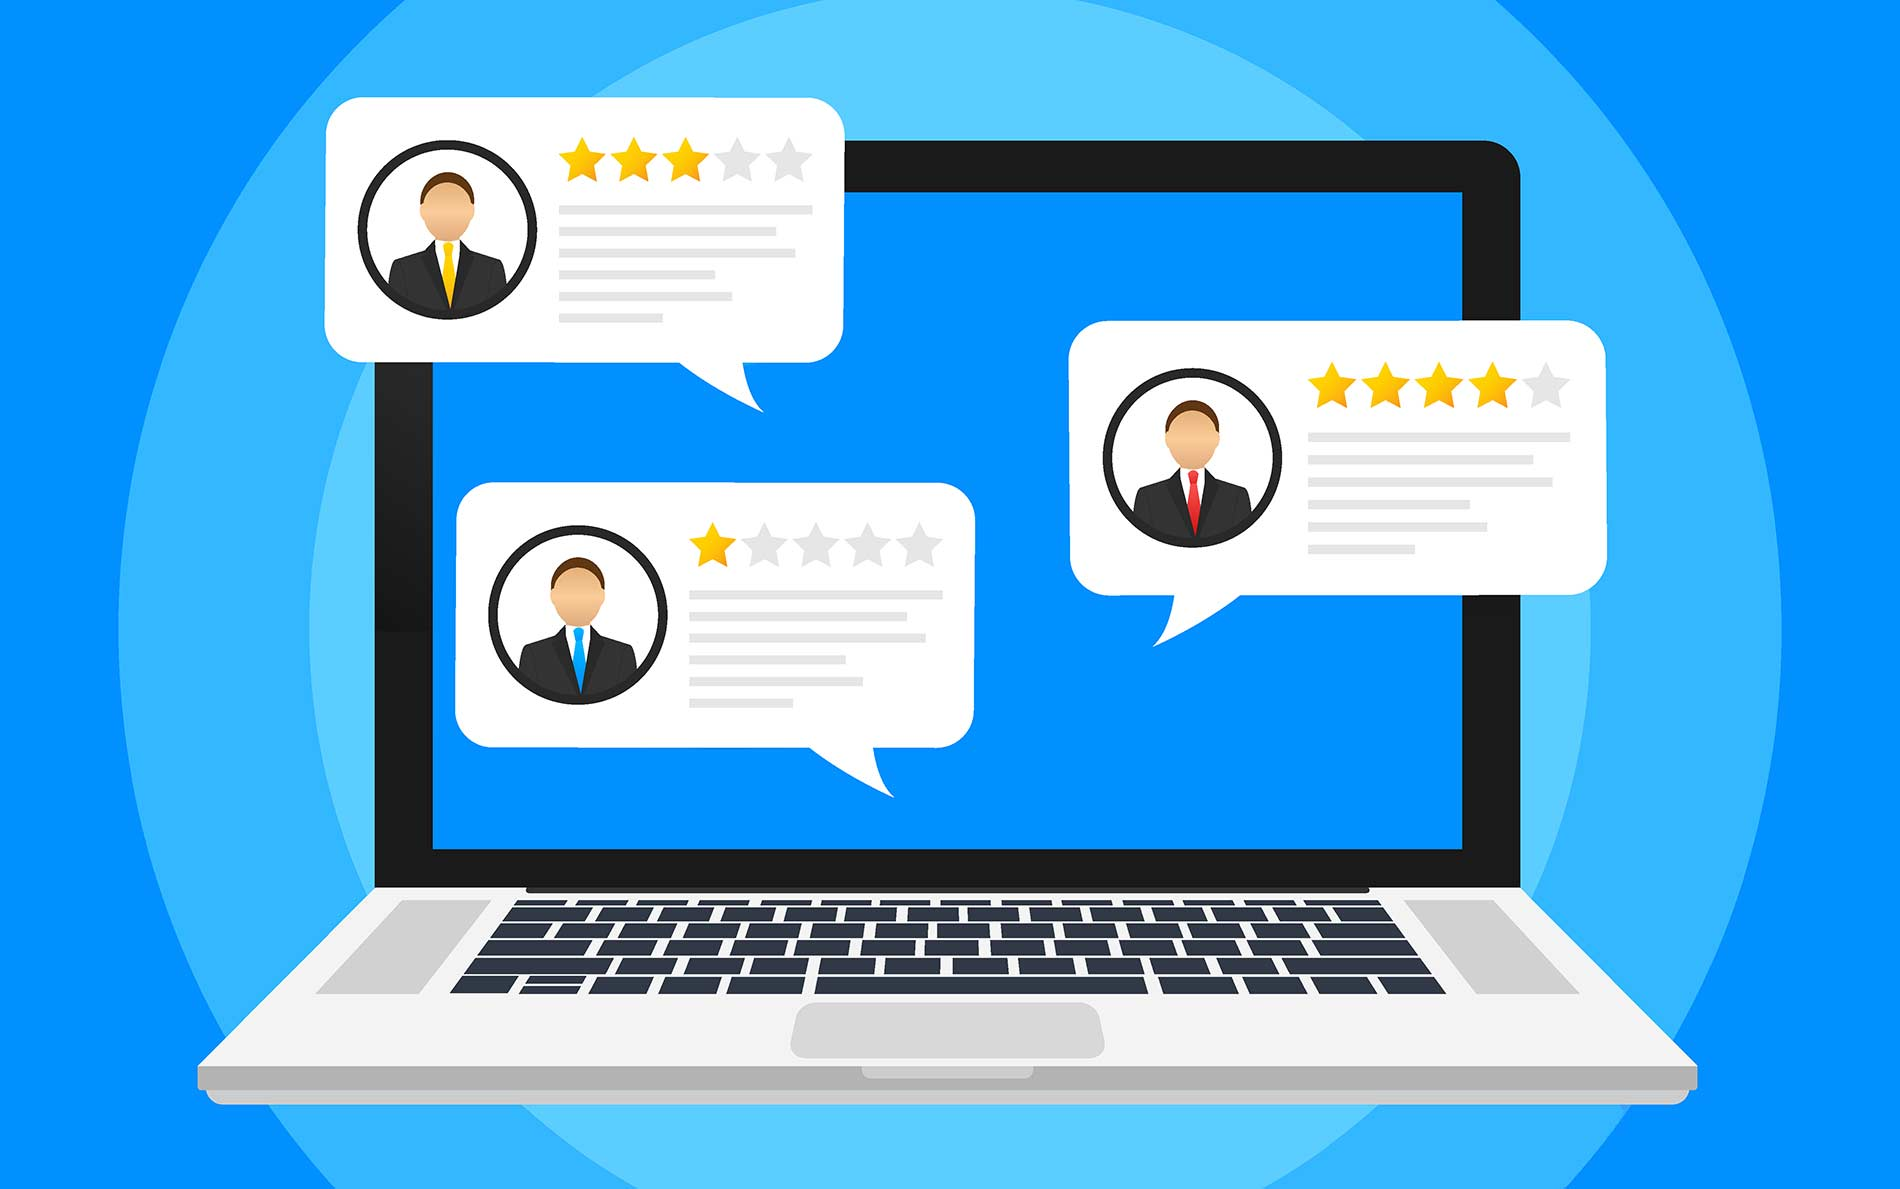 Customer review - online reputation management